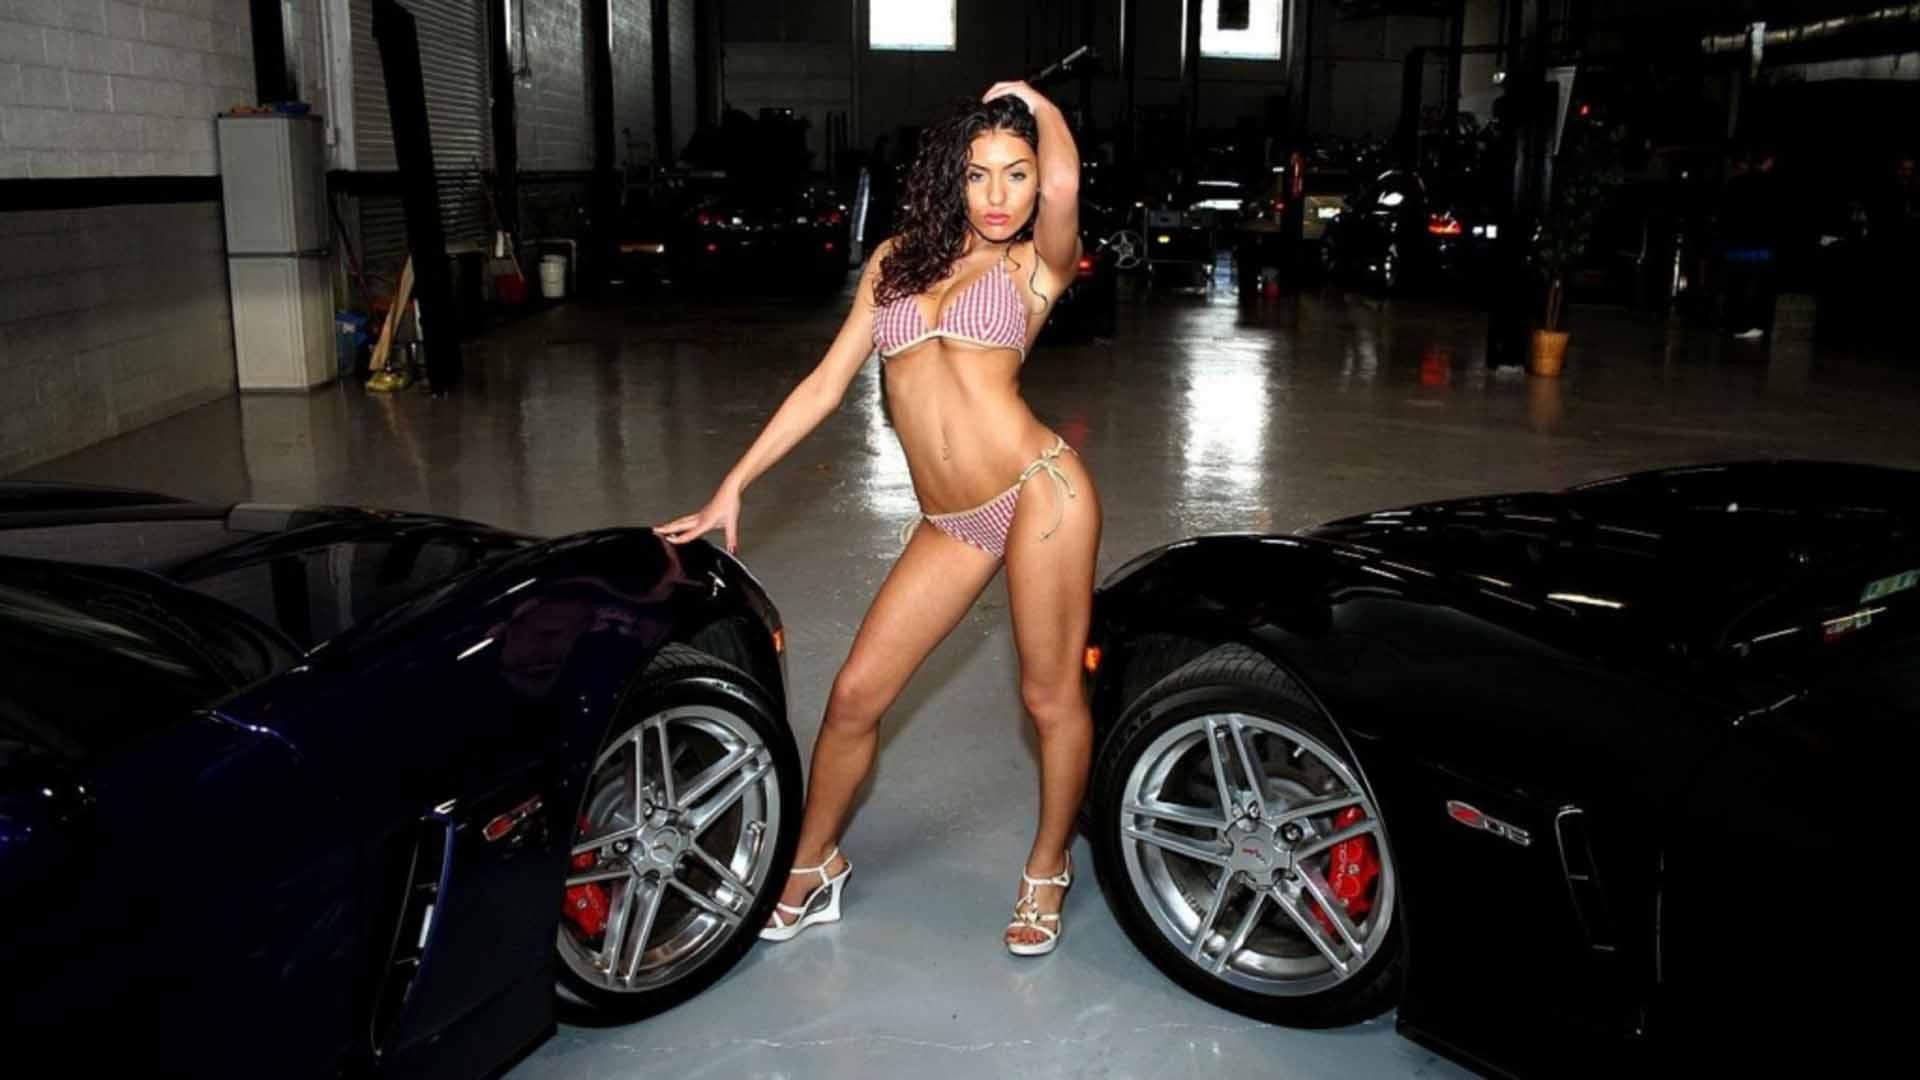 Hot Car Model Wallpaper Posted By John Mercado